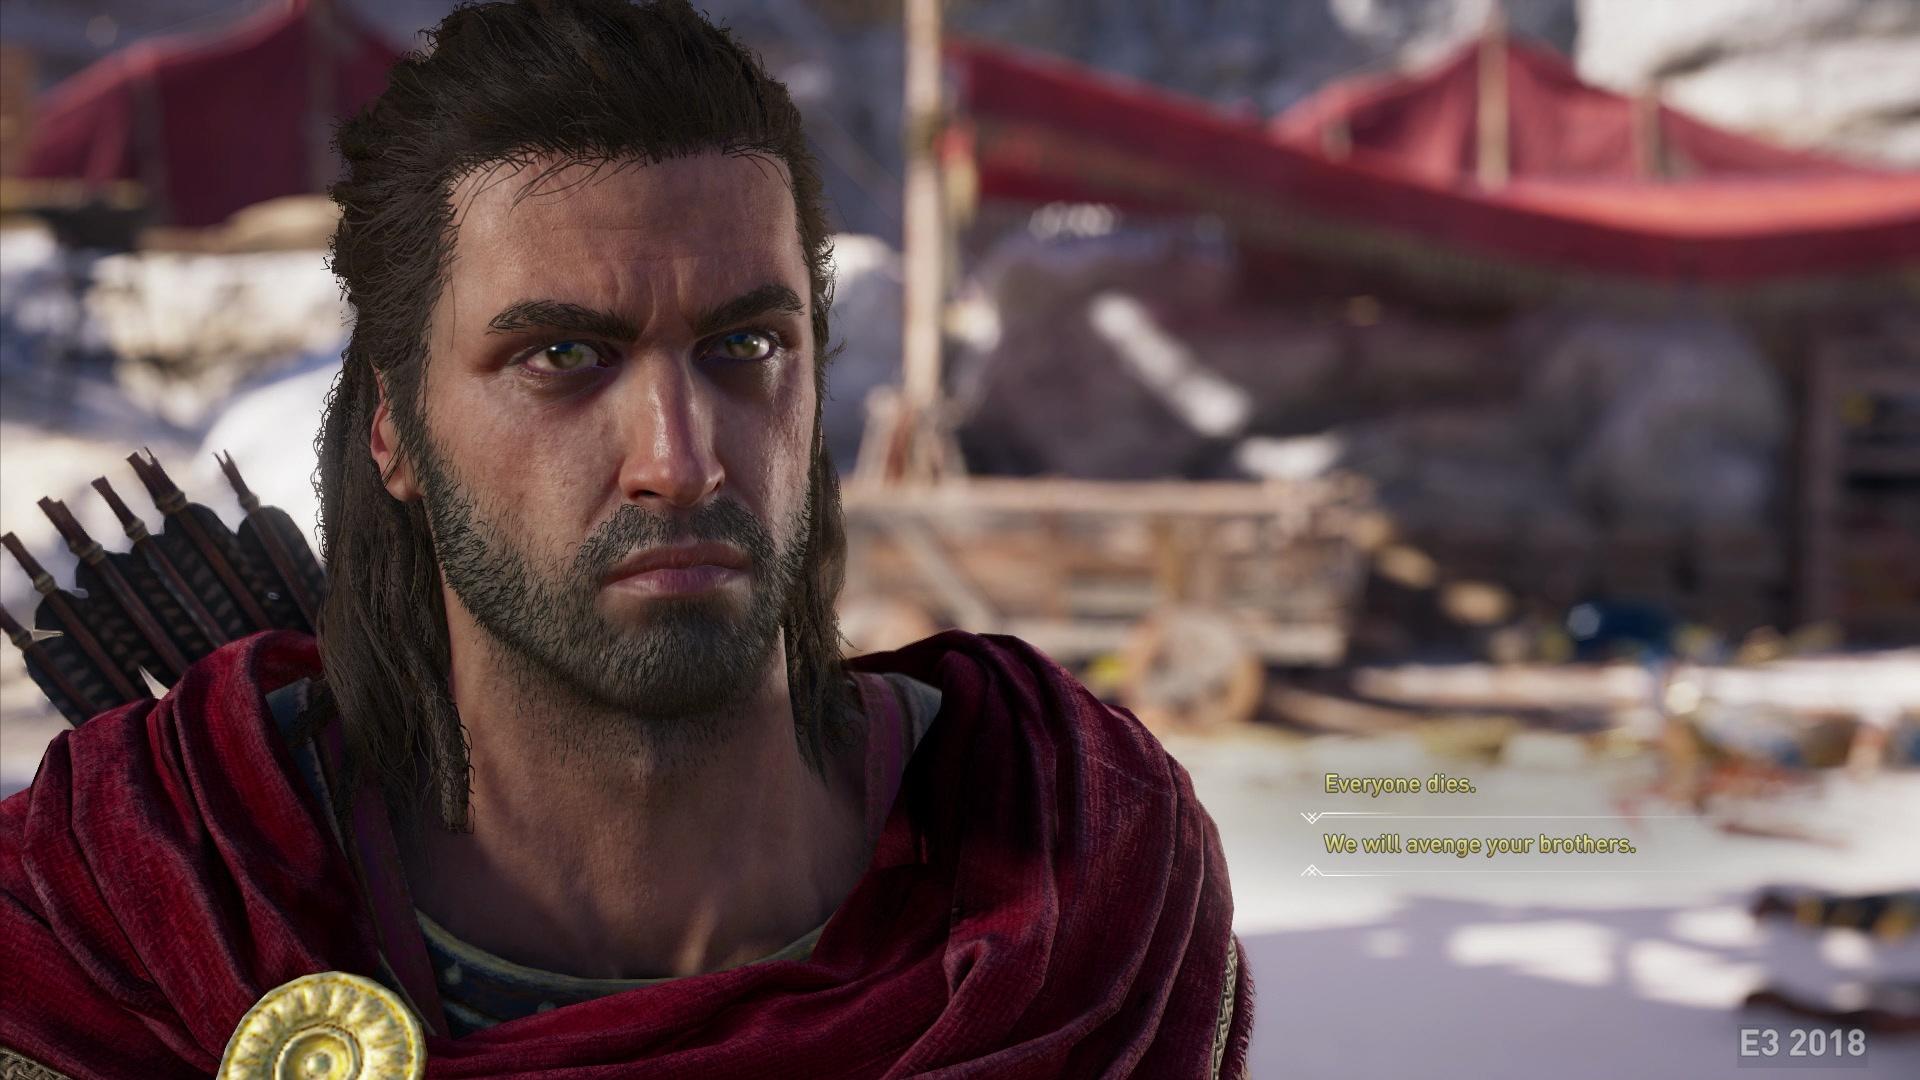 Assassin's Creed Odyssey screenshots leak ...